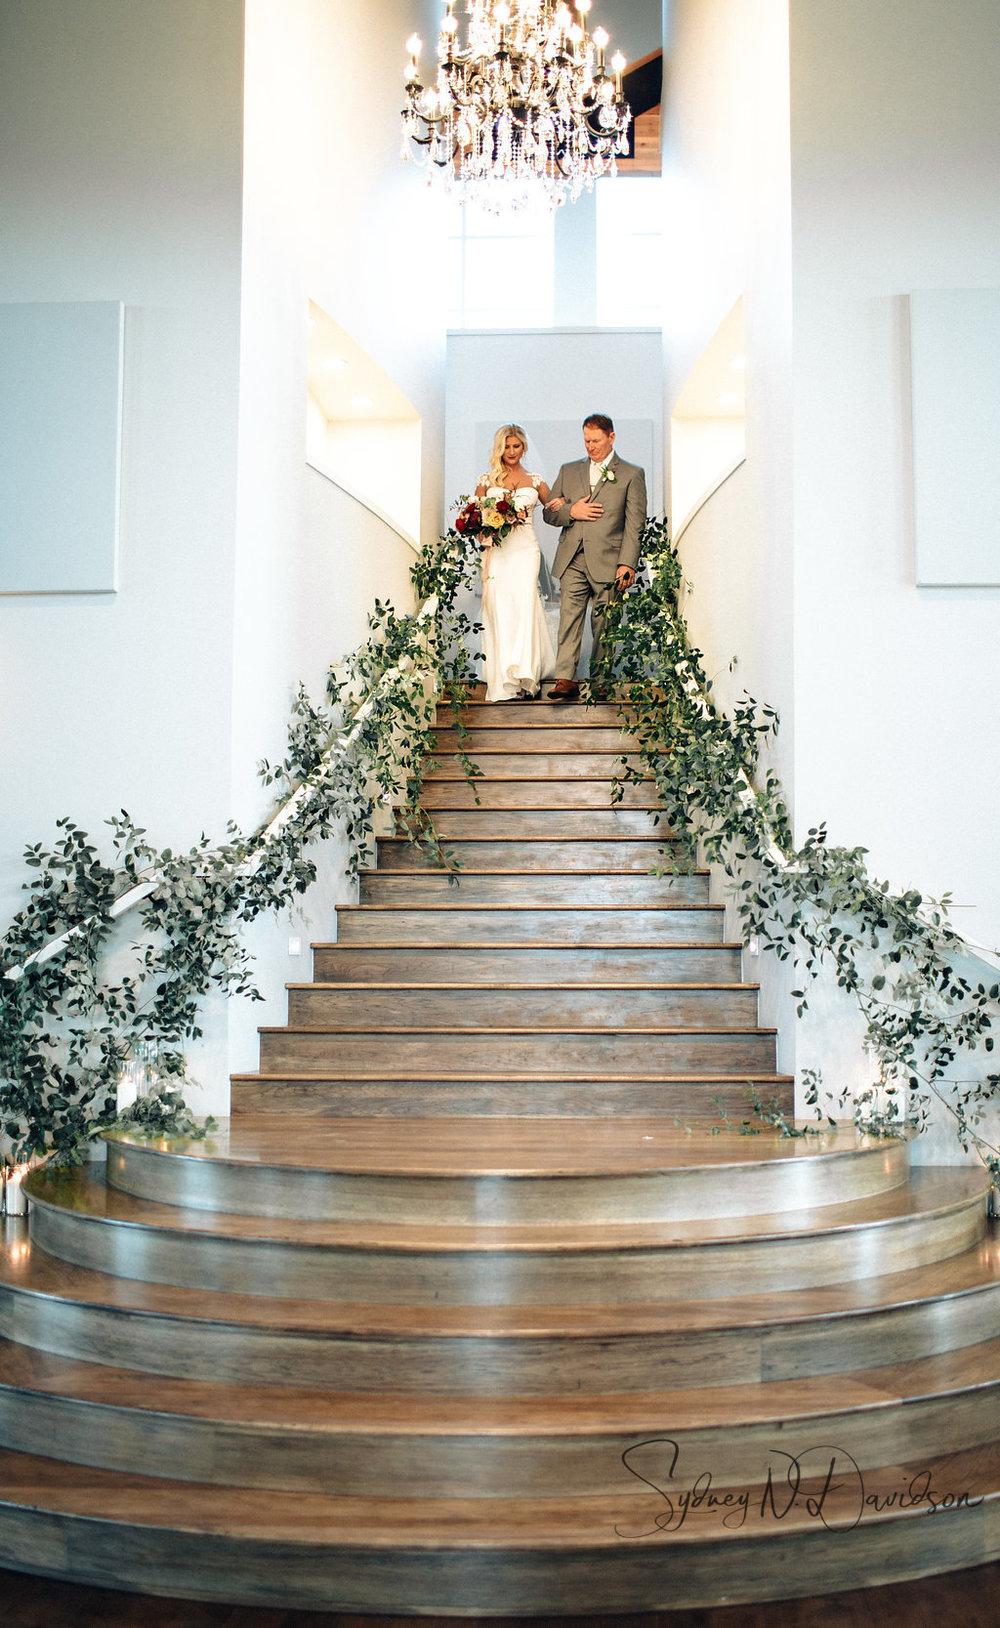 sydney-davidson-wedding-stillwater-oklahoma-wedding-session-traveling-photographer-portrait-tulsa-oklahoma-6496.jpg